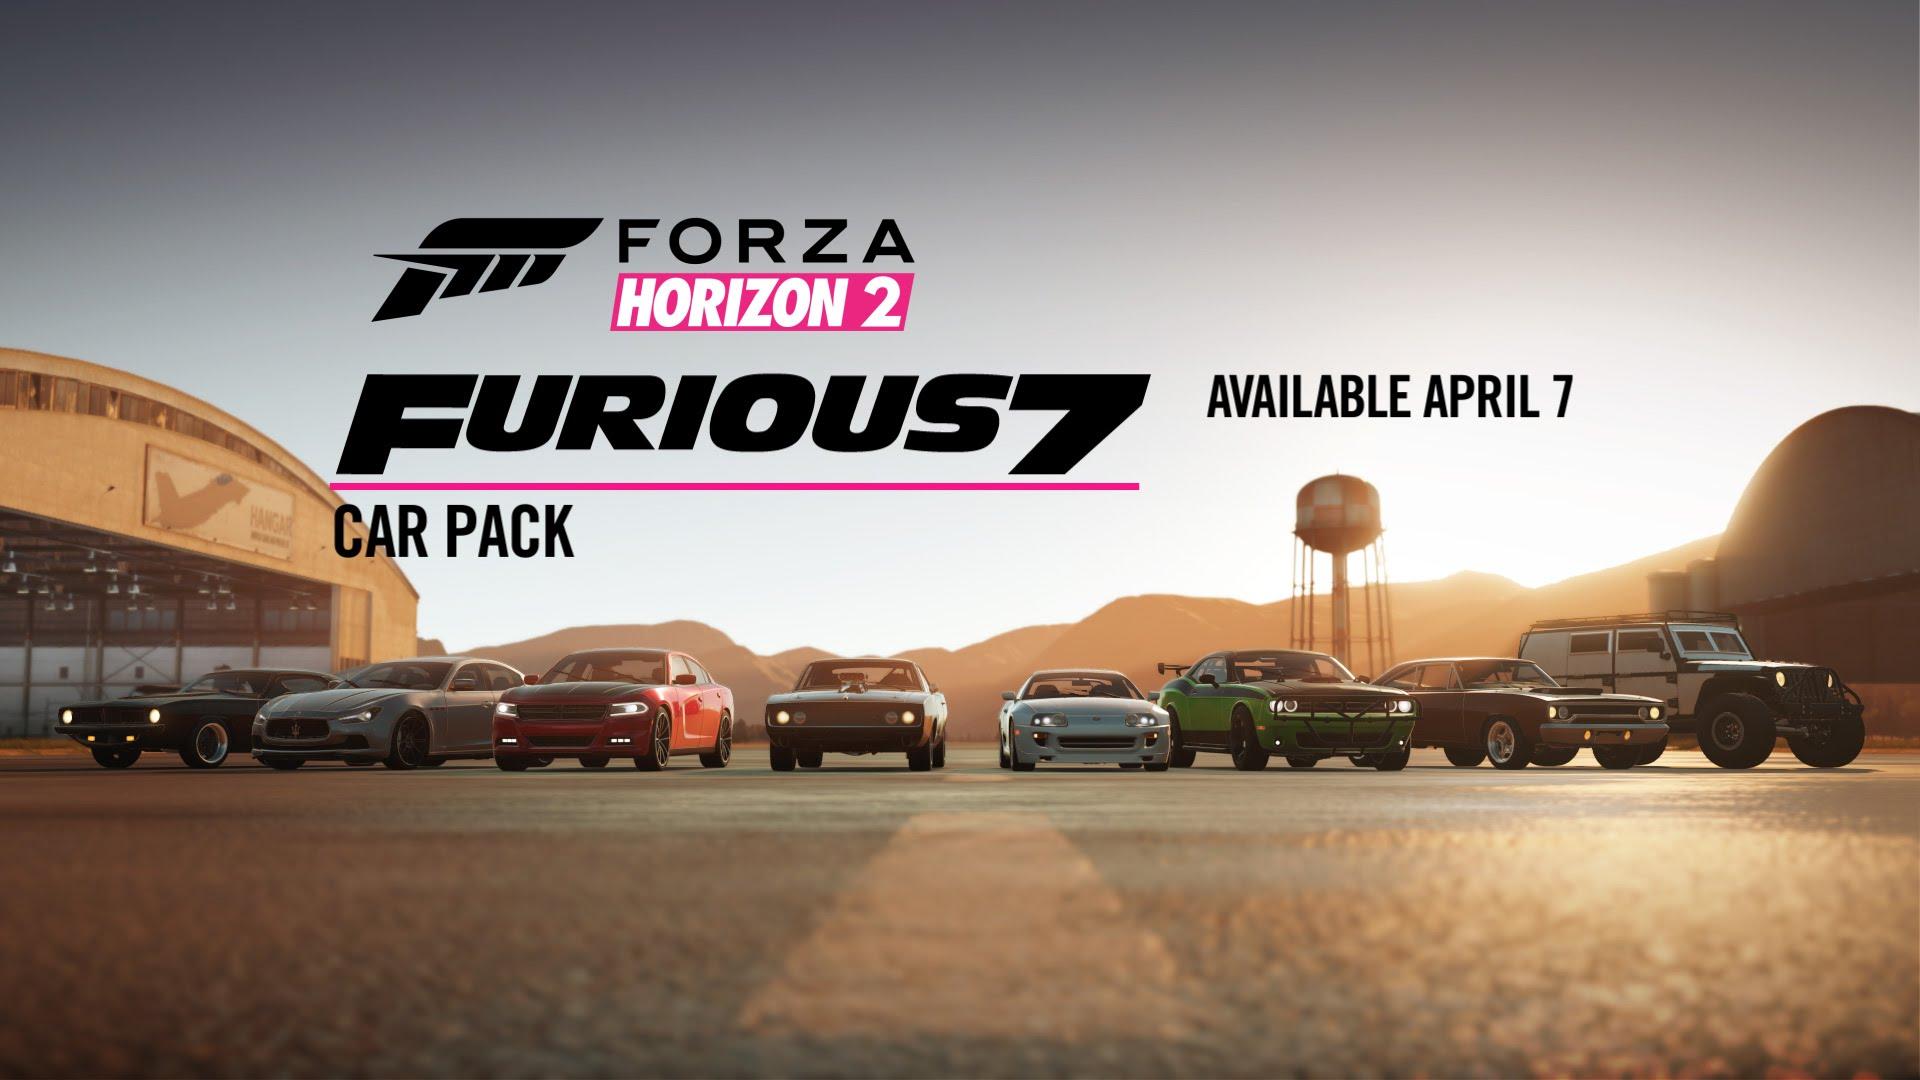 Furious 7 Car Pack Icon Infobox Game Forza Horizon 2